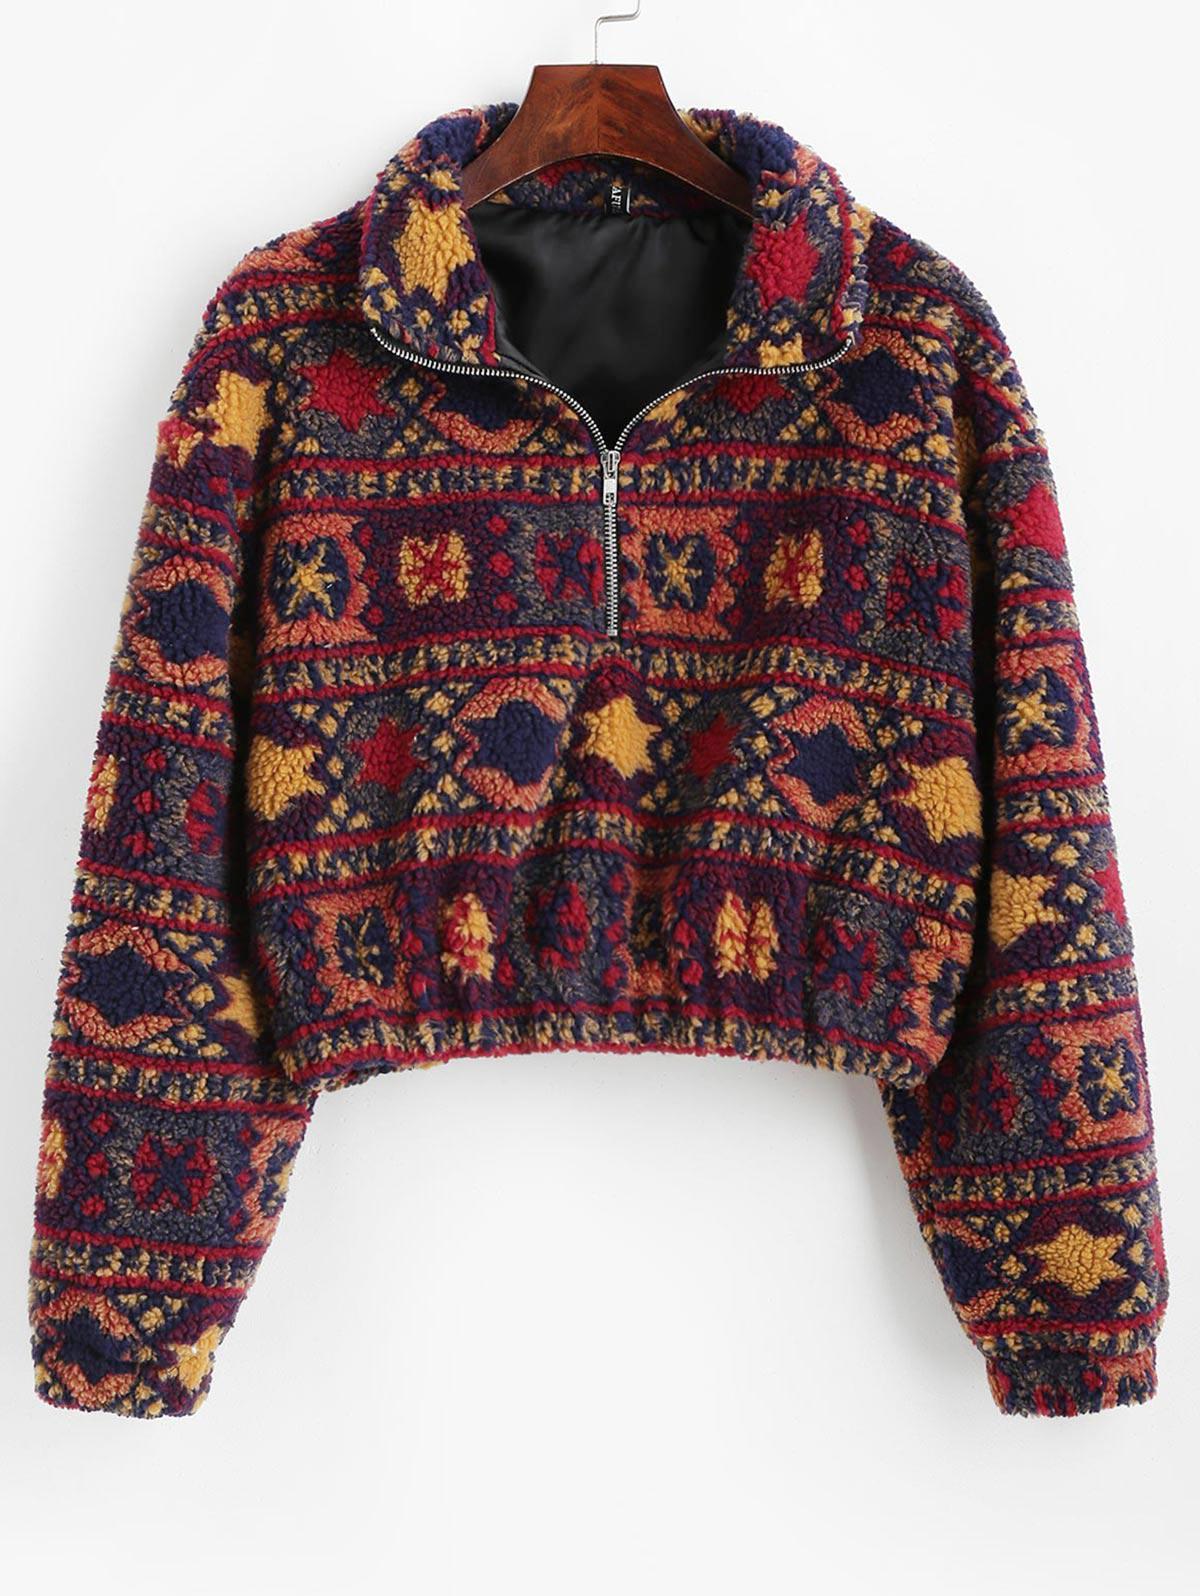 Sweat-shirt Tribal Imprimé à Demi-Zip M - Zaful FR - Modalova